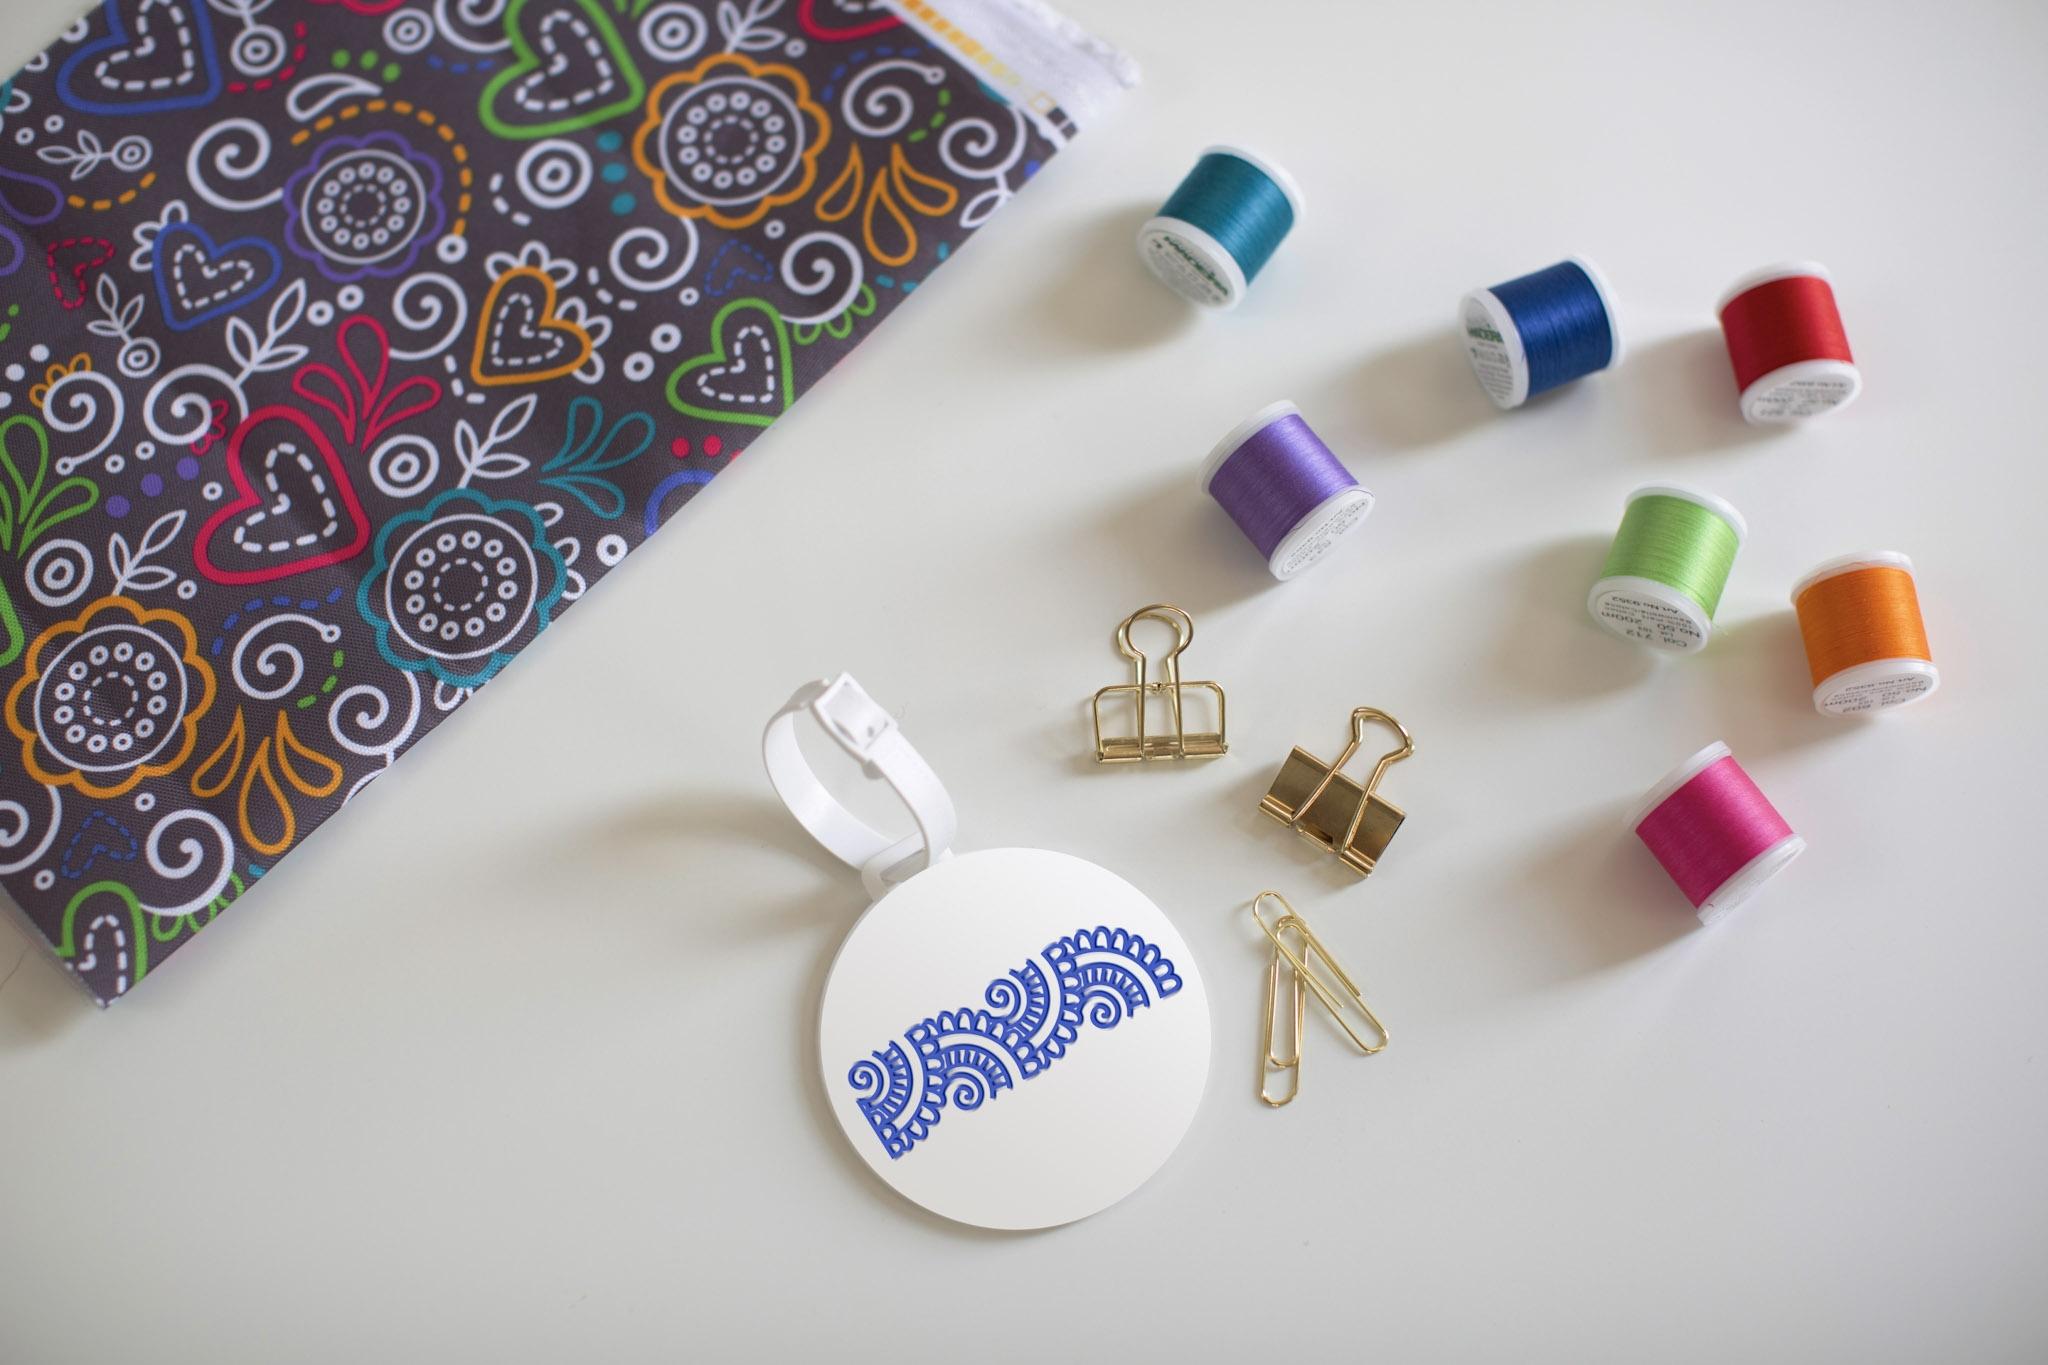 Accomplish Luggage Tag - BLLT-ACCOMPLISH - Baby Lock